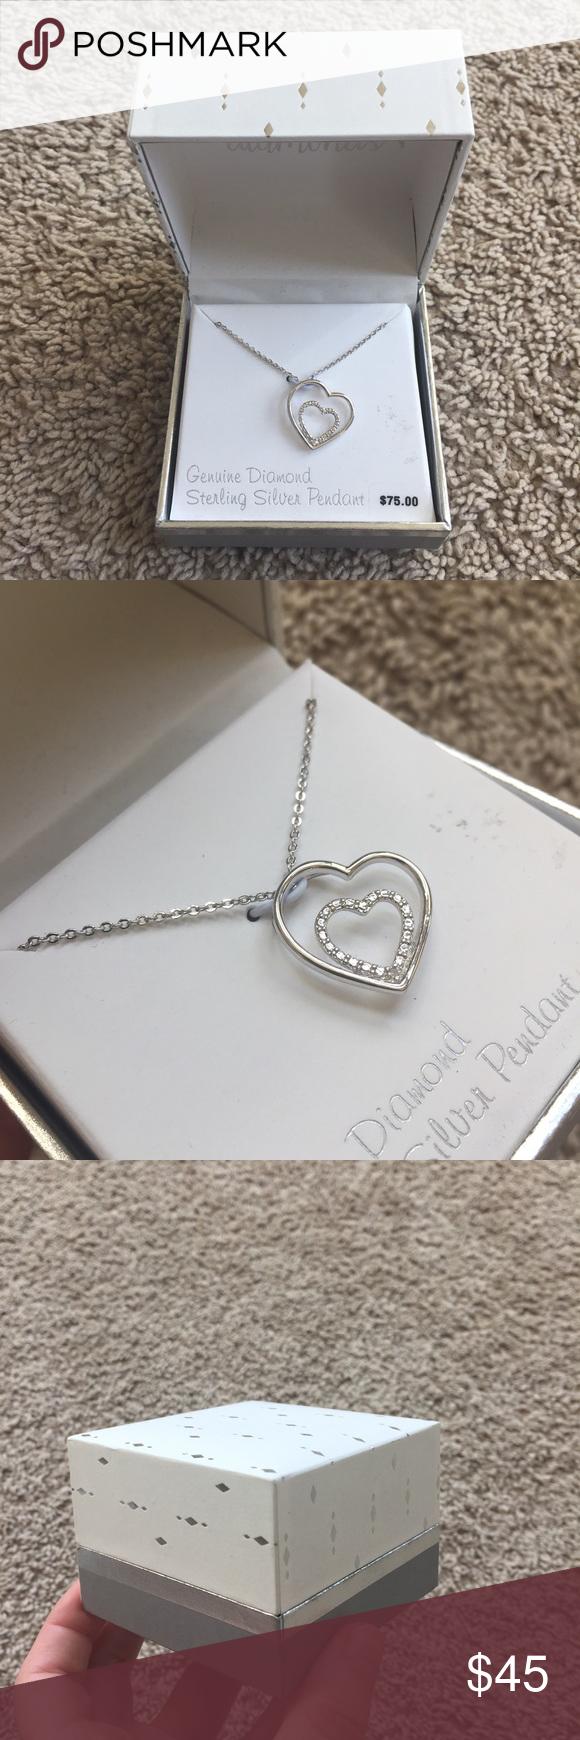 Spotted while shopping on Poshmark: Silver Necklace! #poshmark #fashion #shopping #style #Jewelry